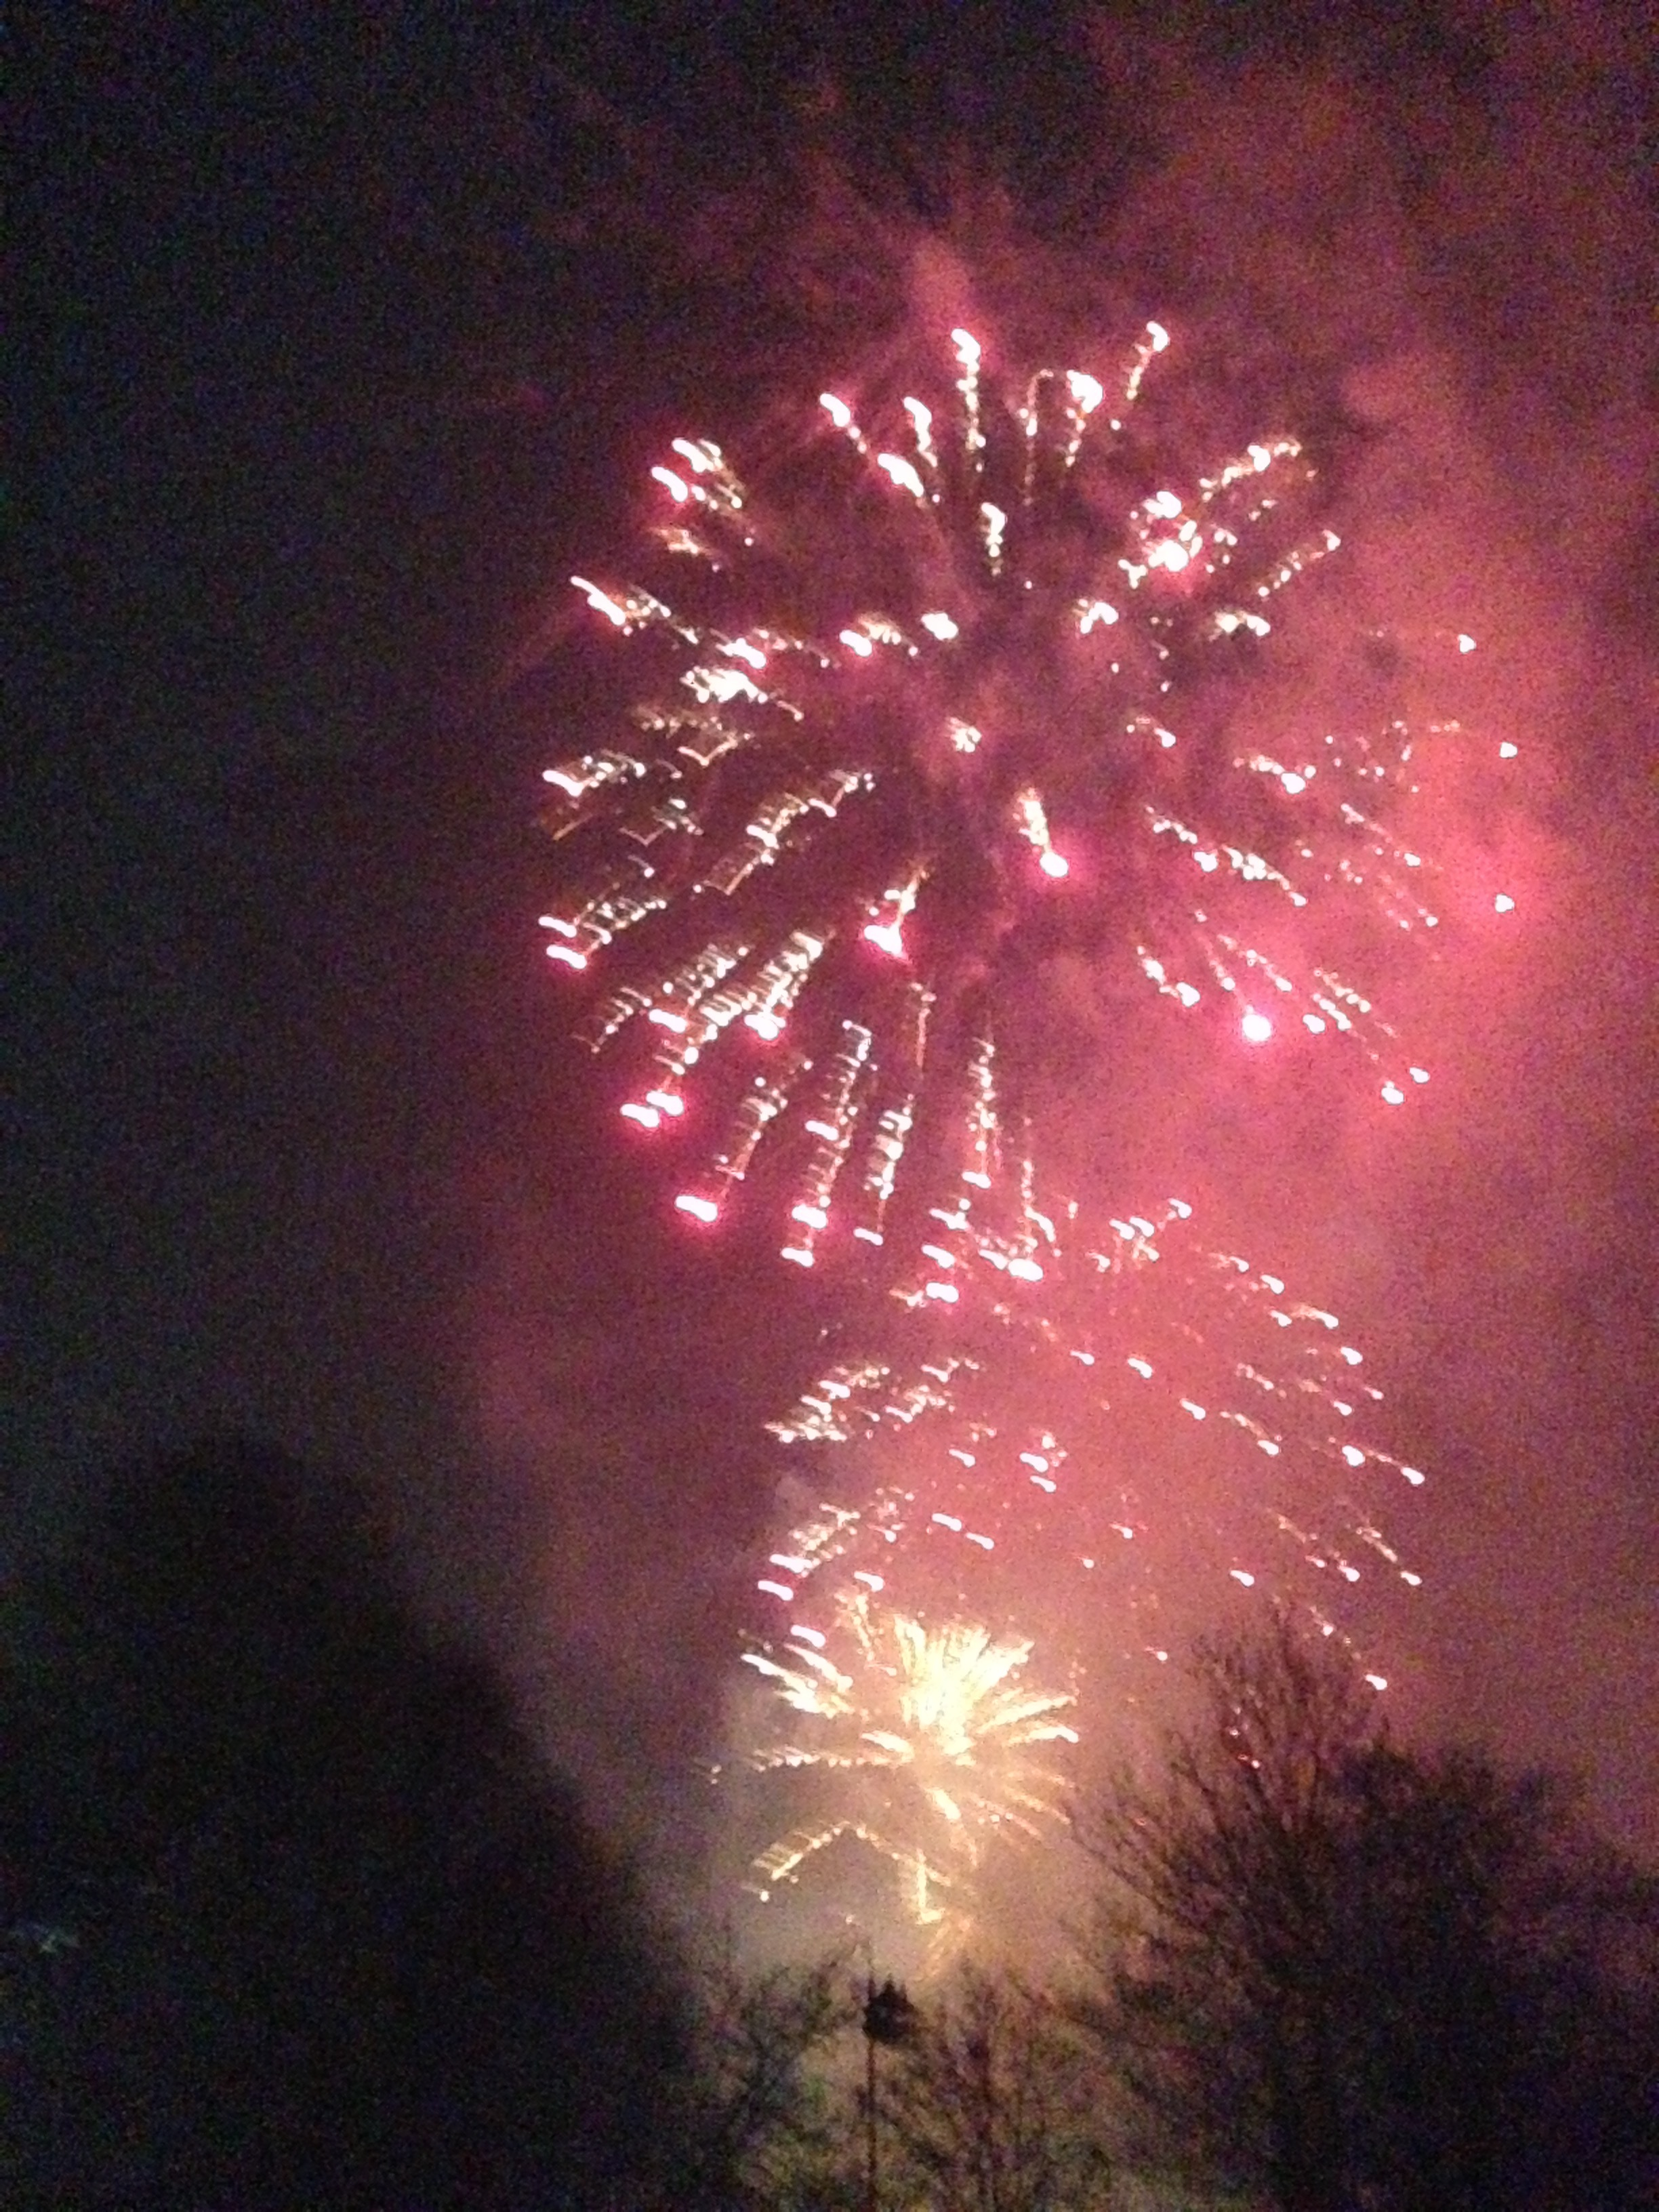 - Bedford pre-Christmas fireworks, November 2018